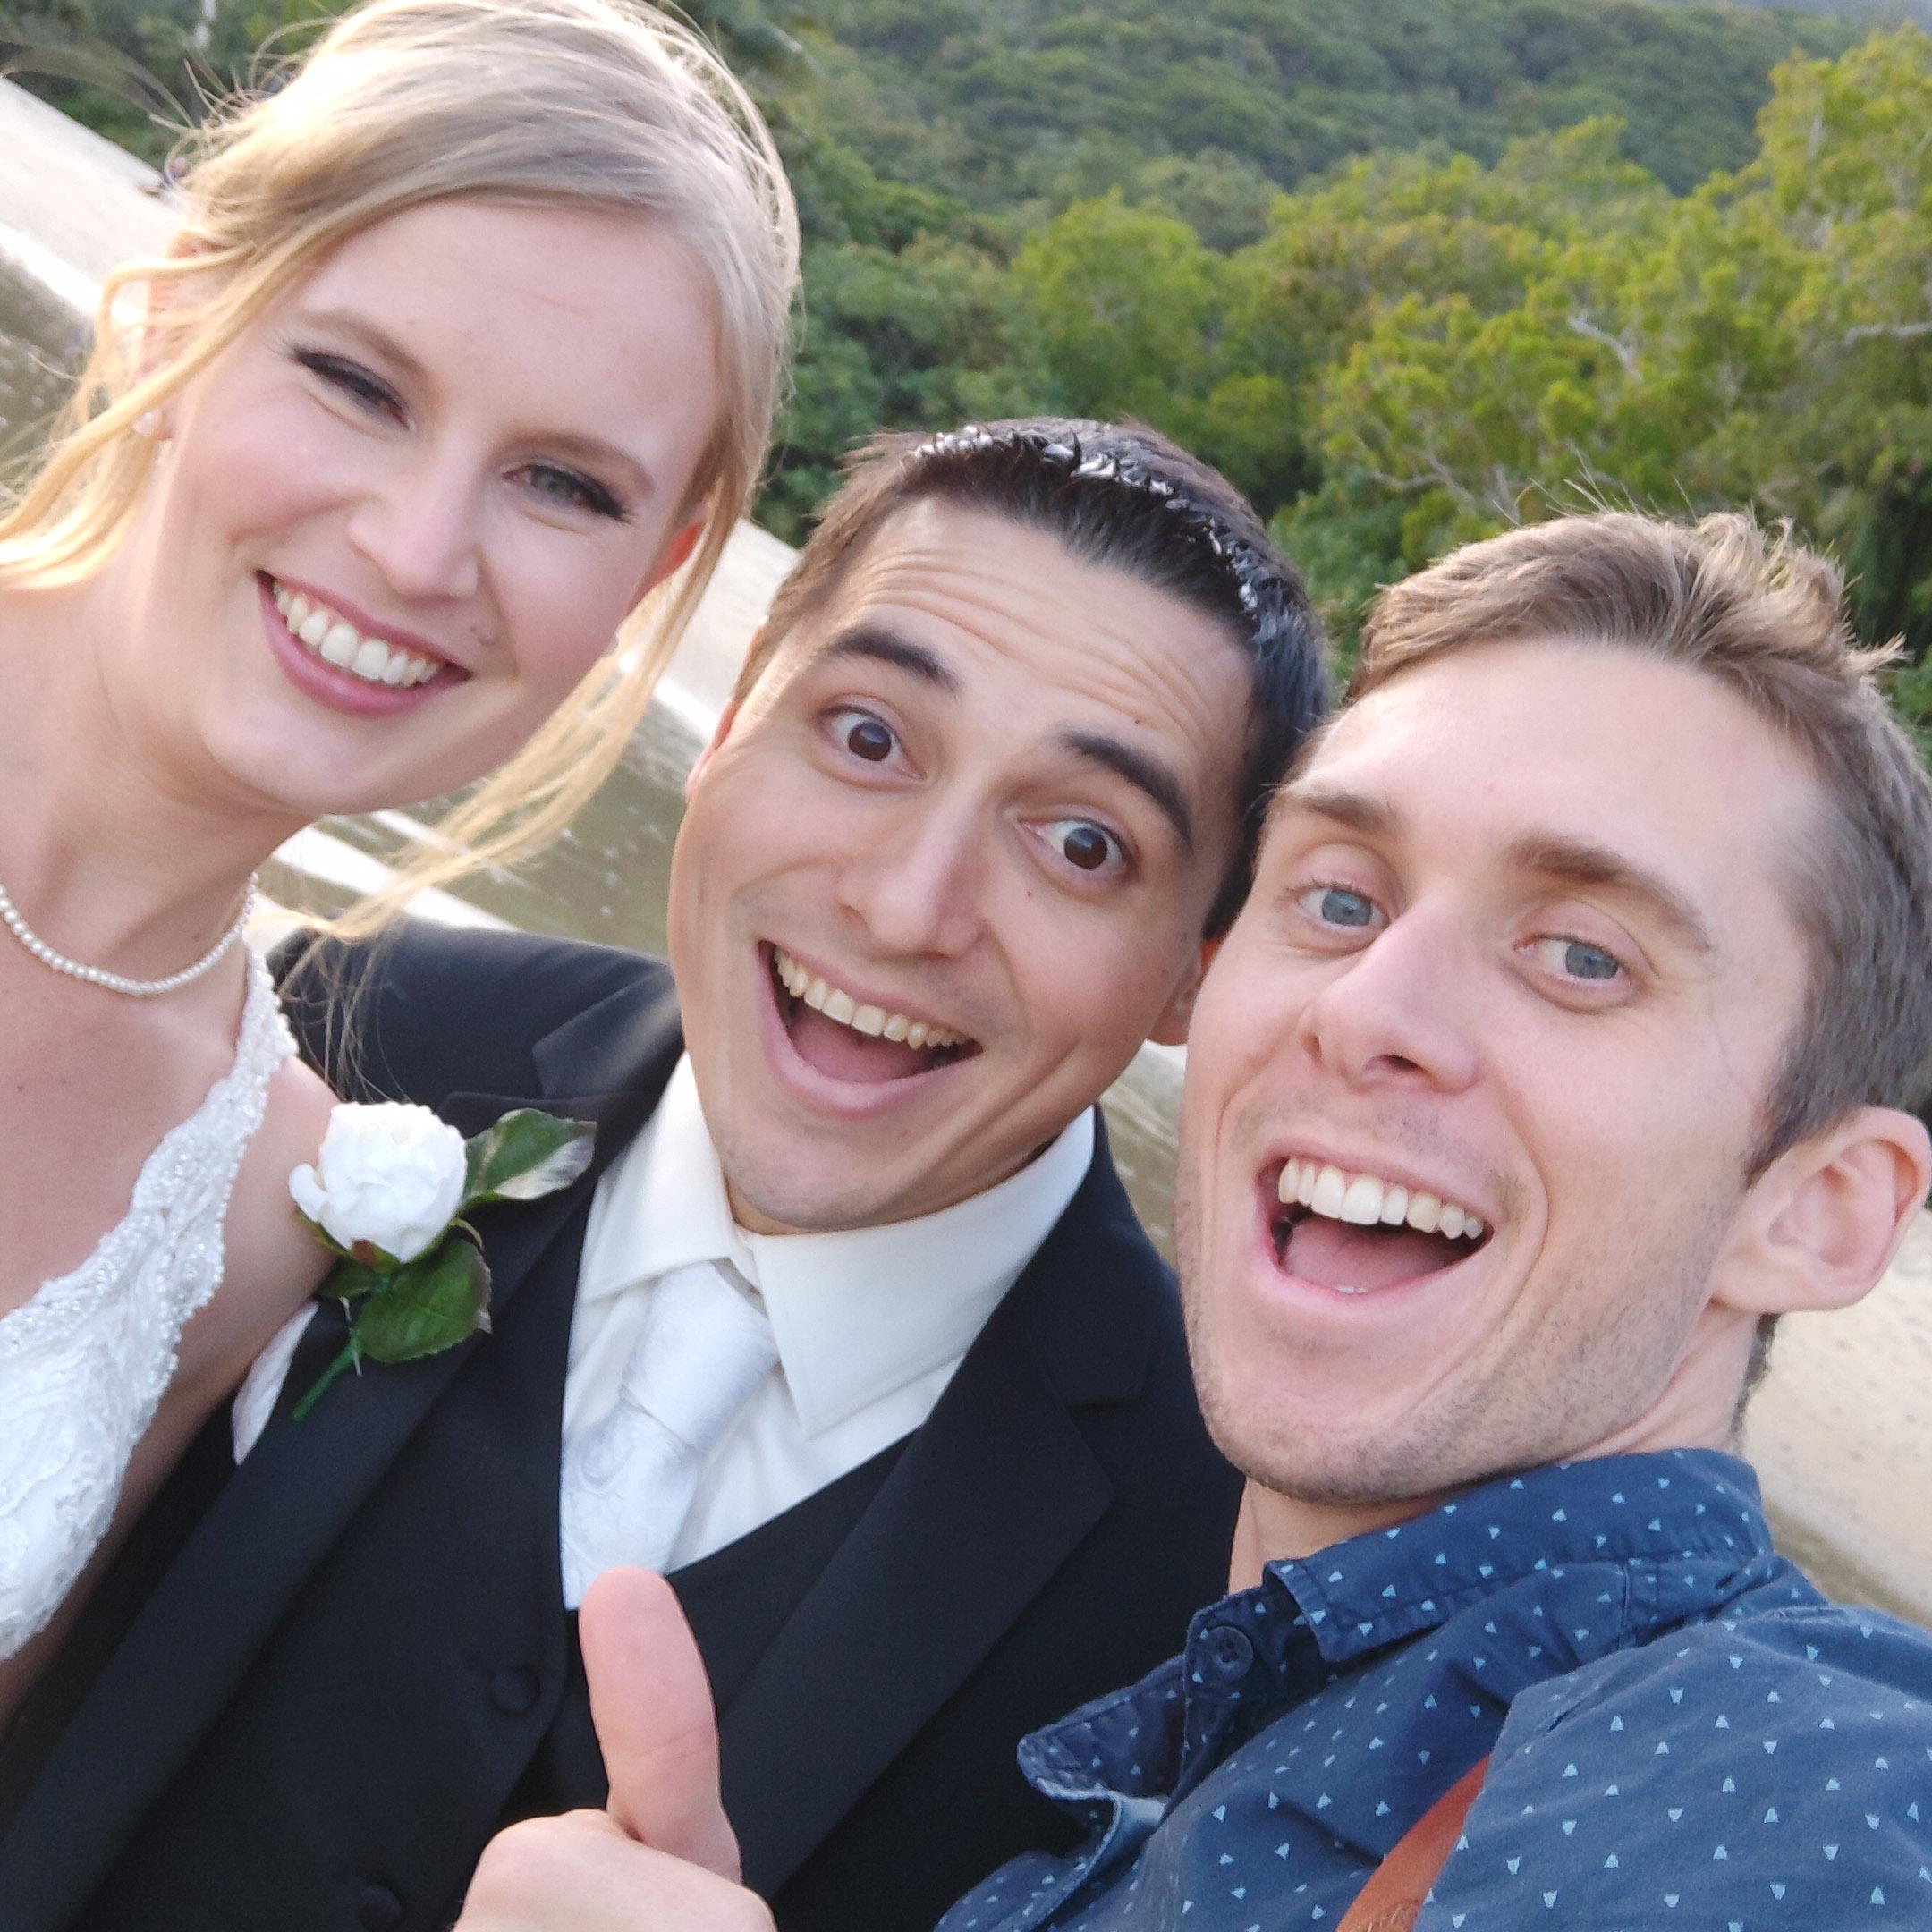 The-raw-photographer-cairns-wedding-photography-bridalparty-selfie-15.jpg